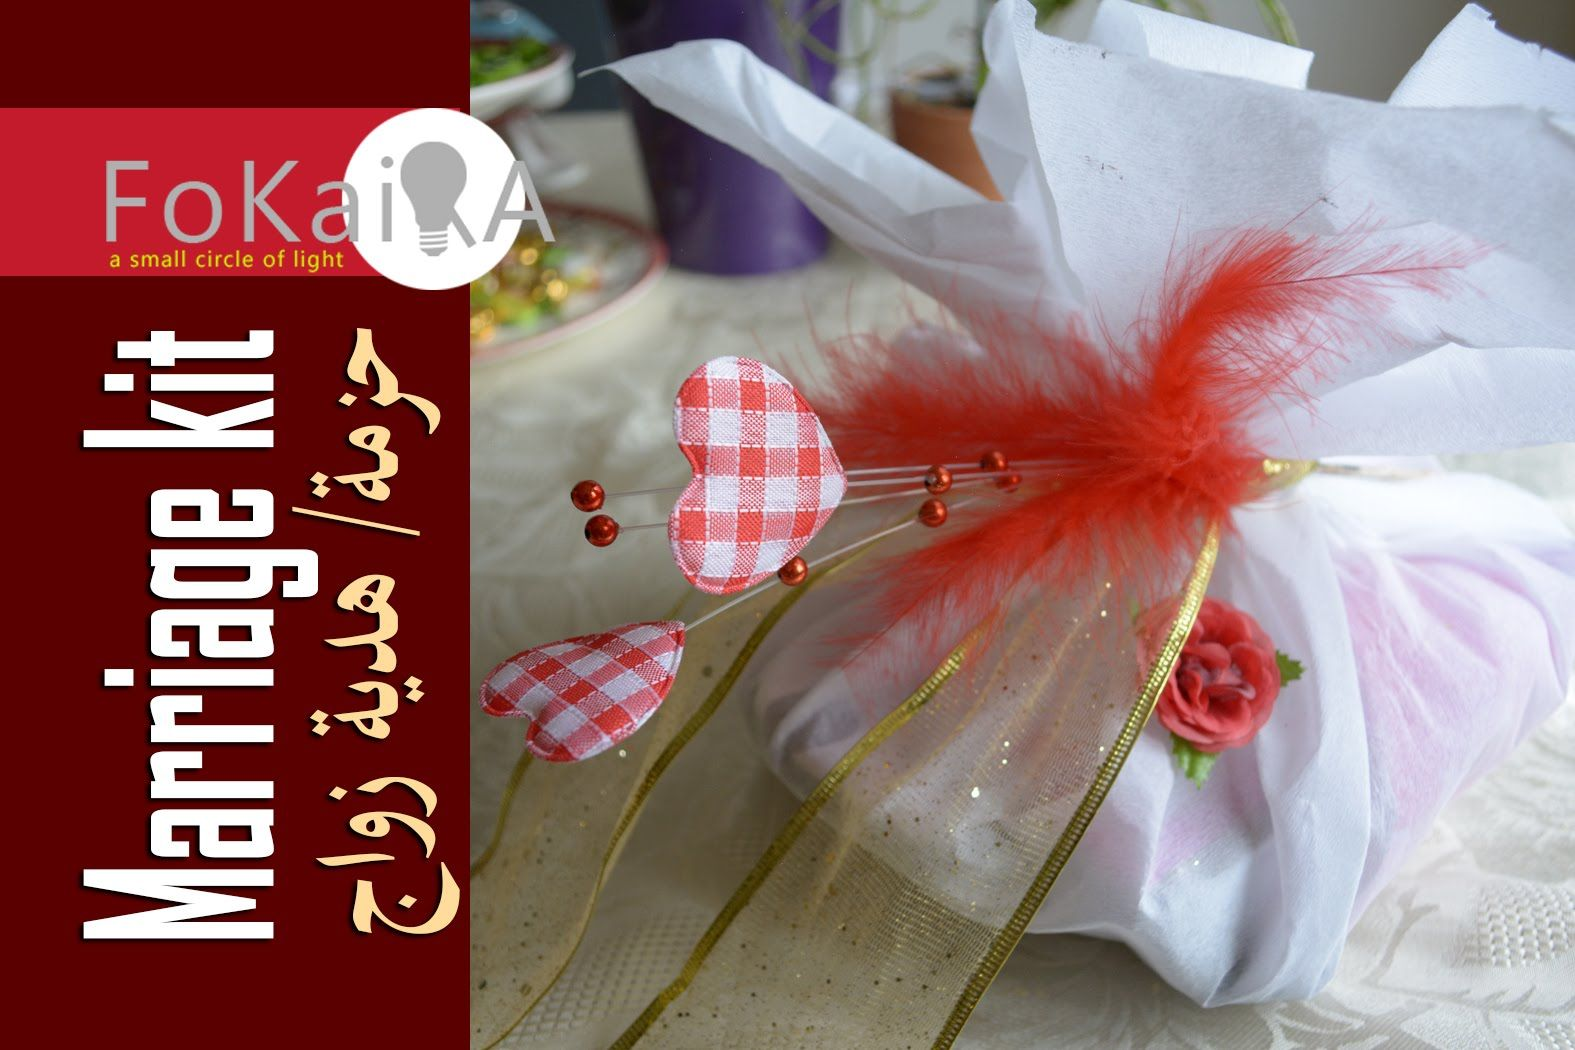 Marriage Kit Or Wedding Gift الفكيرة 95 هدية زفاف أو حزمة الزواج Table Decorations Decor Home Decor